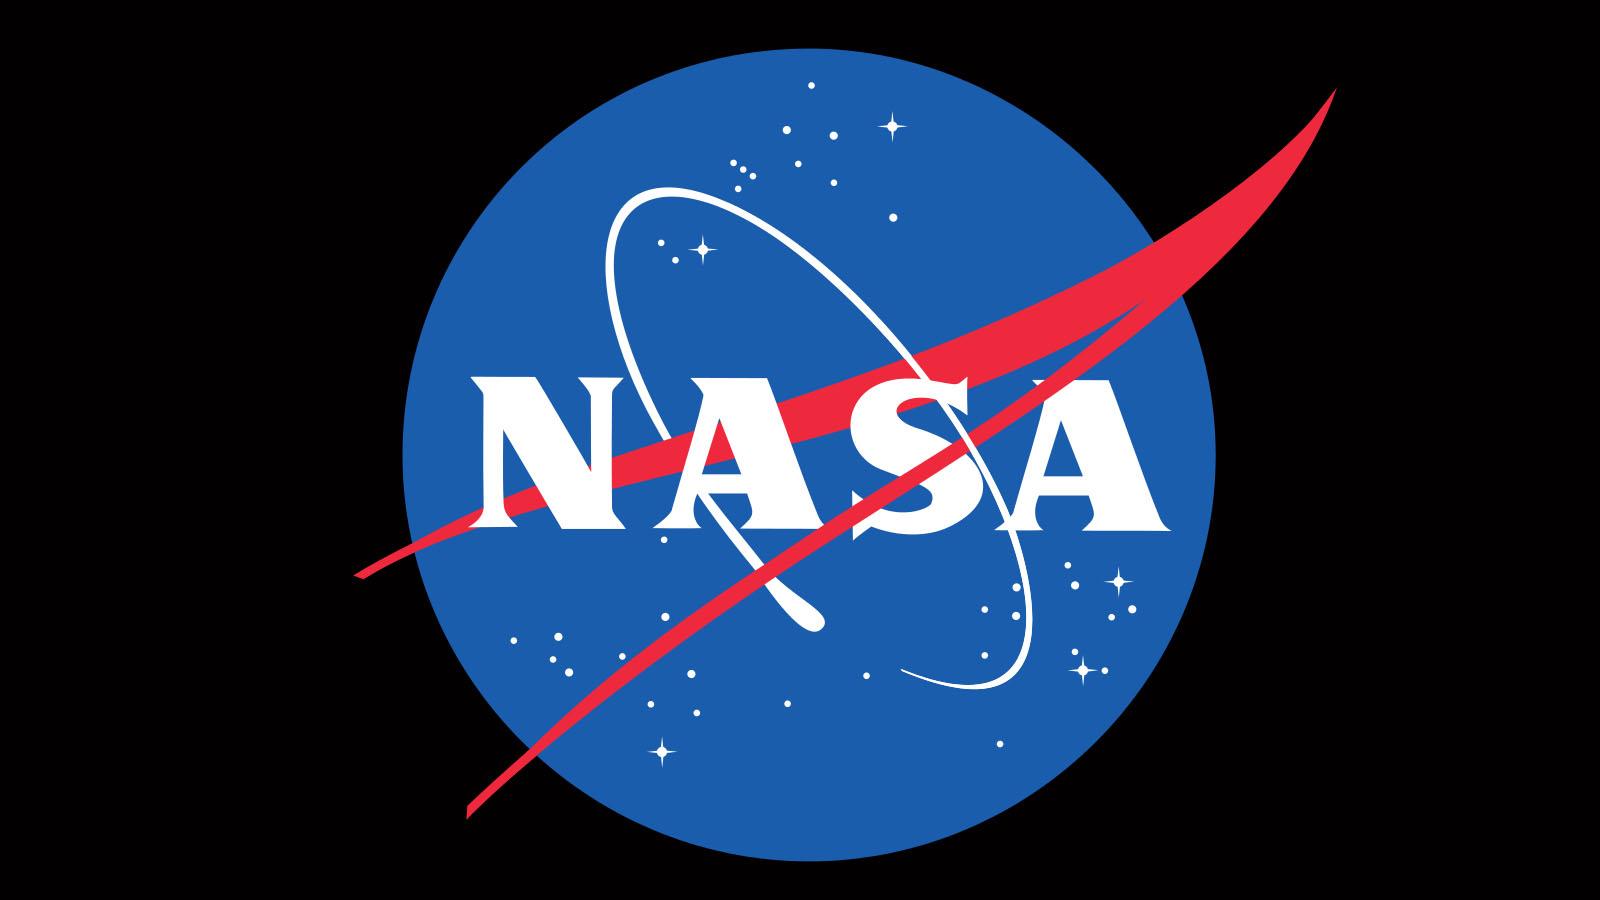 nasa logo 2017 -#main